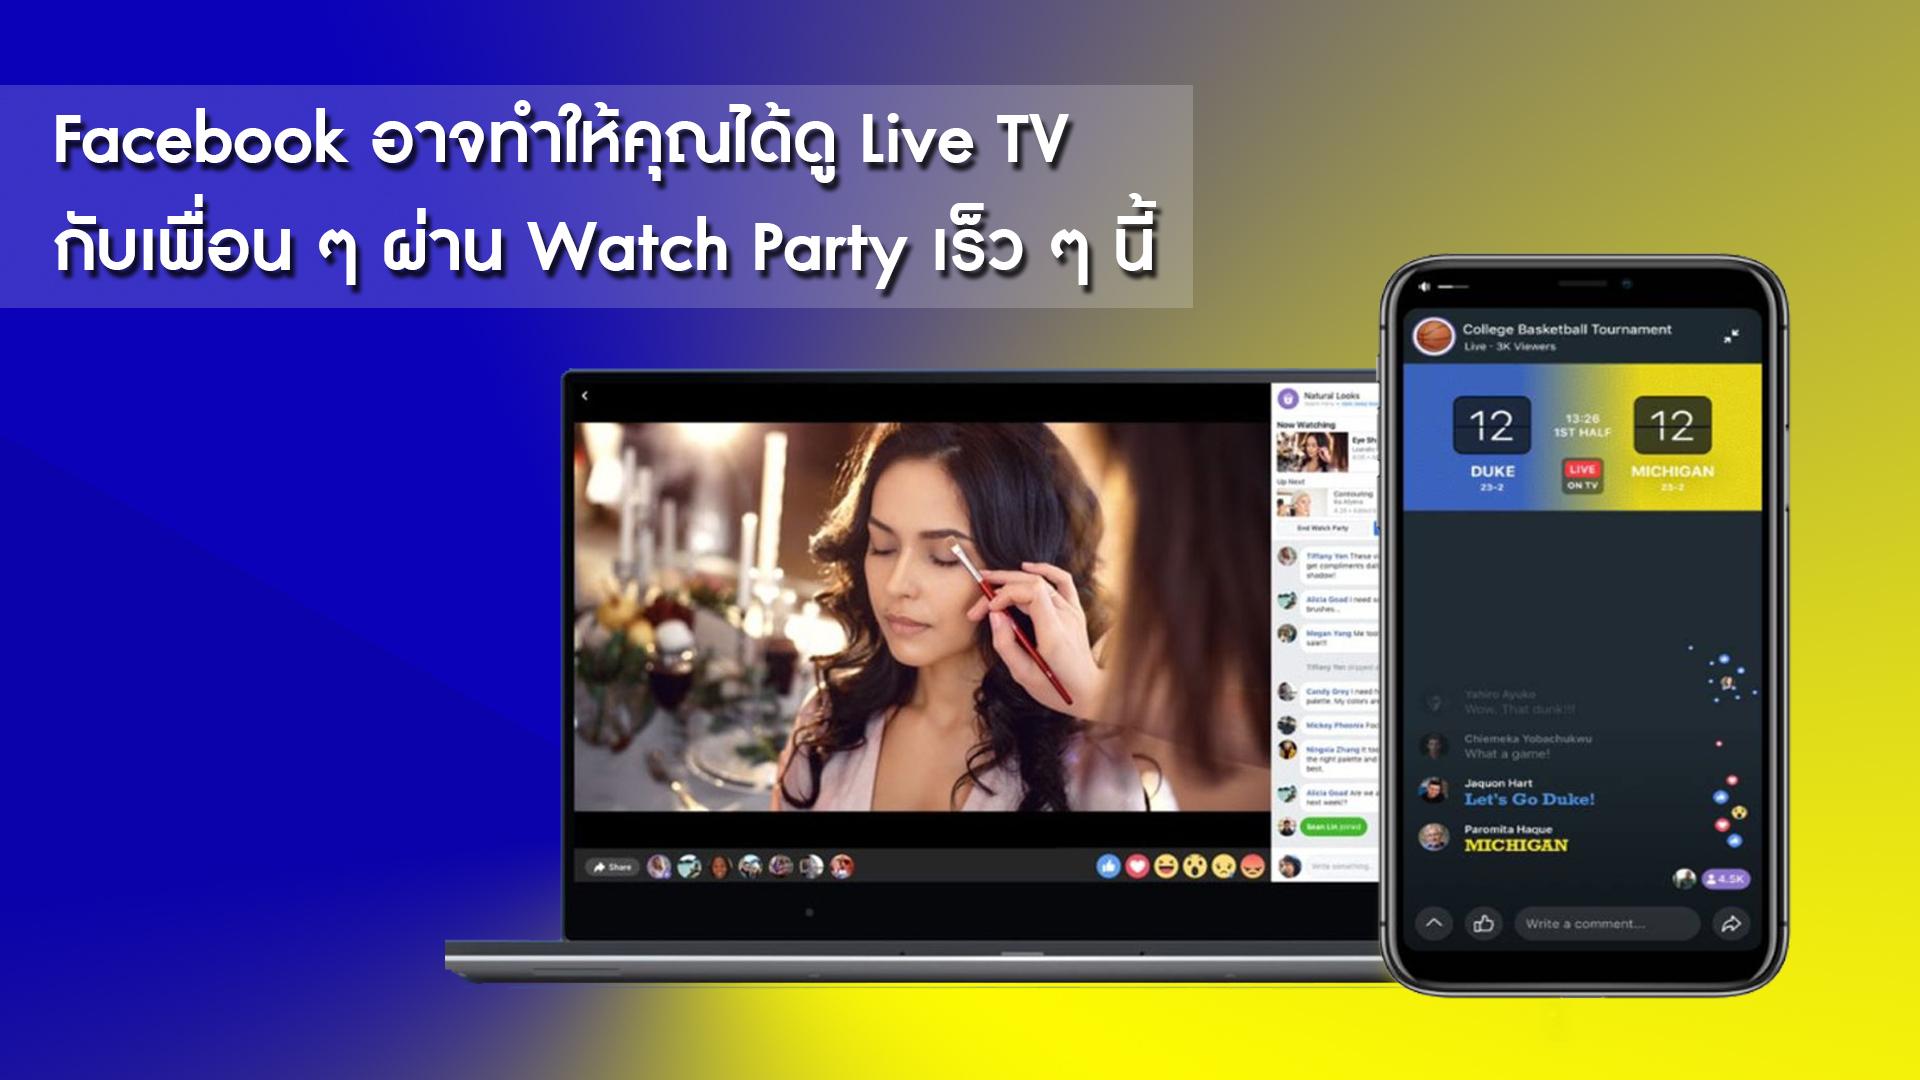 Facebook อาจทำให้คุณได้ดู Live TV  กับเพื่อน ๆ ผ่าน Watch Party เร็ว ๆ นี้